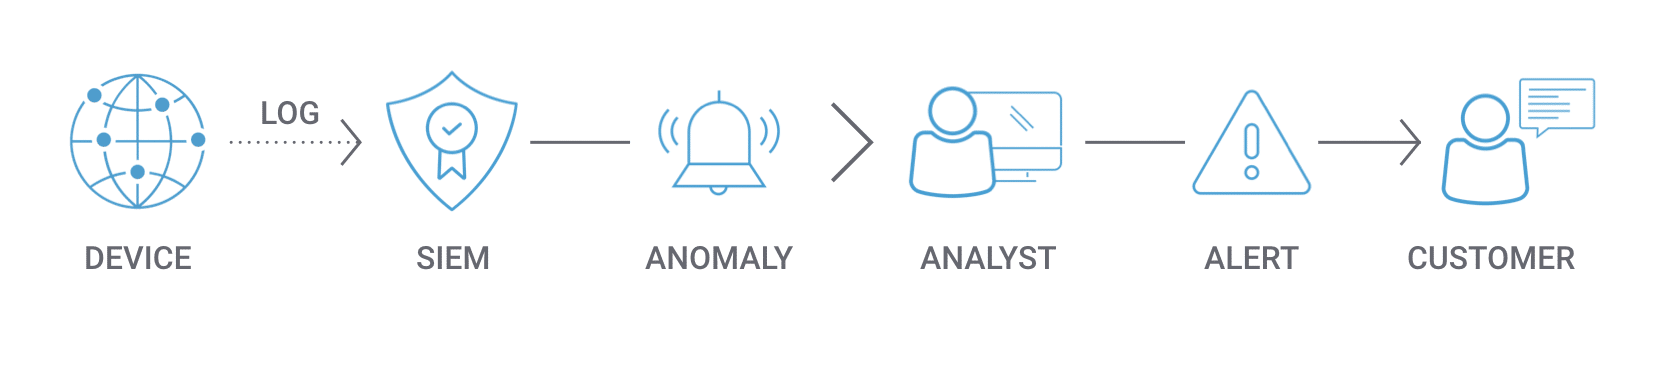 Device siem anomaly analyst alert customer